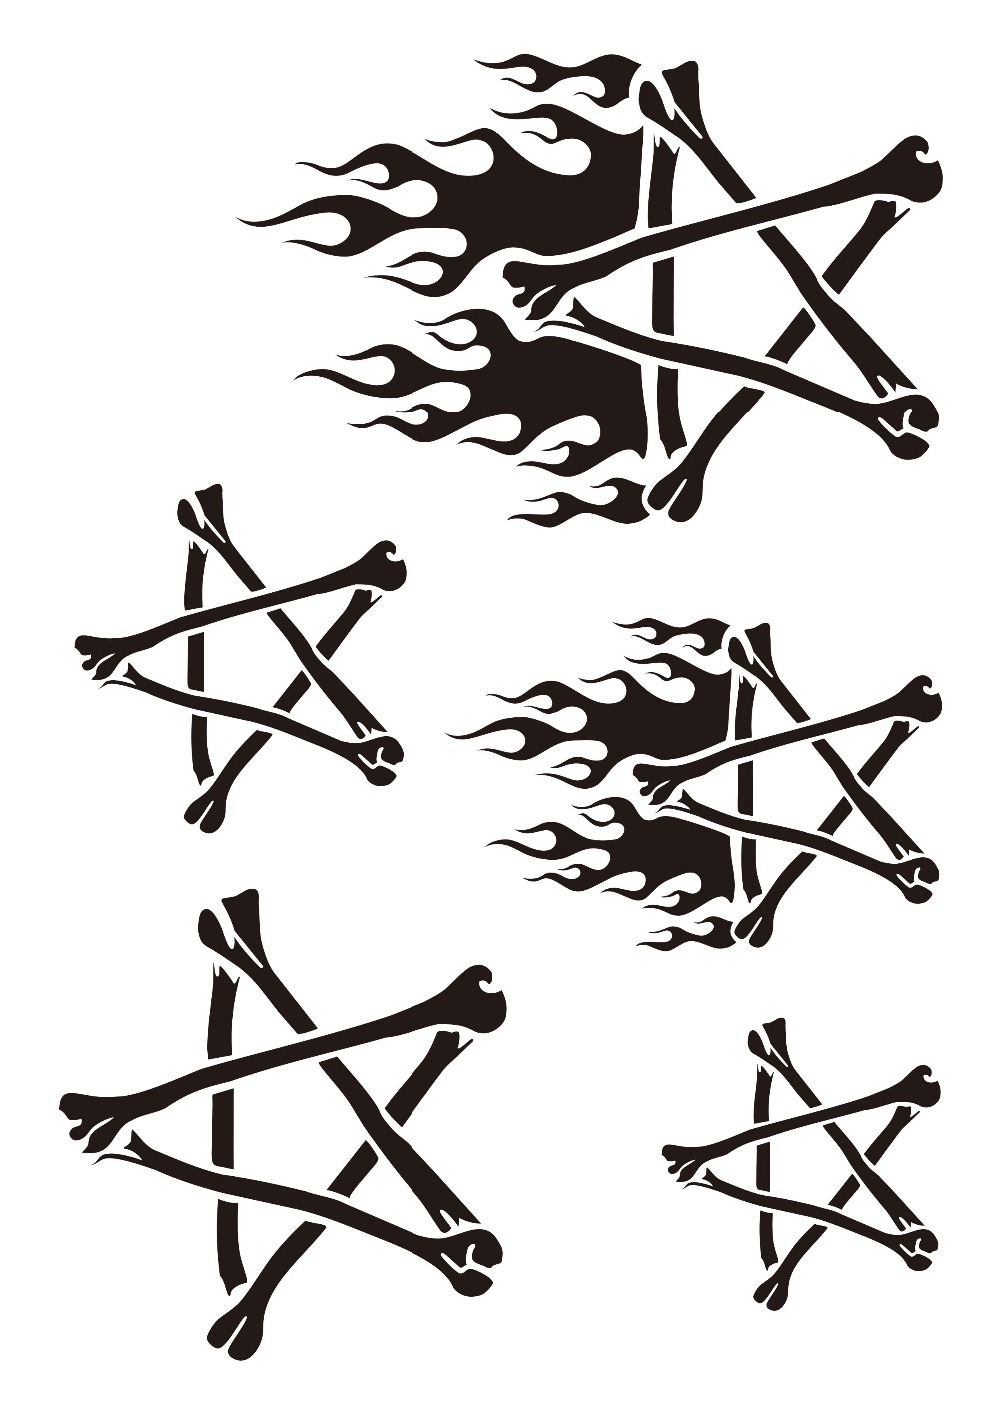 Privremeni Airbrush Tattoo Stencil Knjiga Airbrush šablone Template - Tetovaže i tjelesna umjetnost - Foto 6